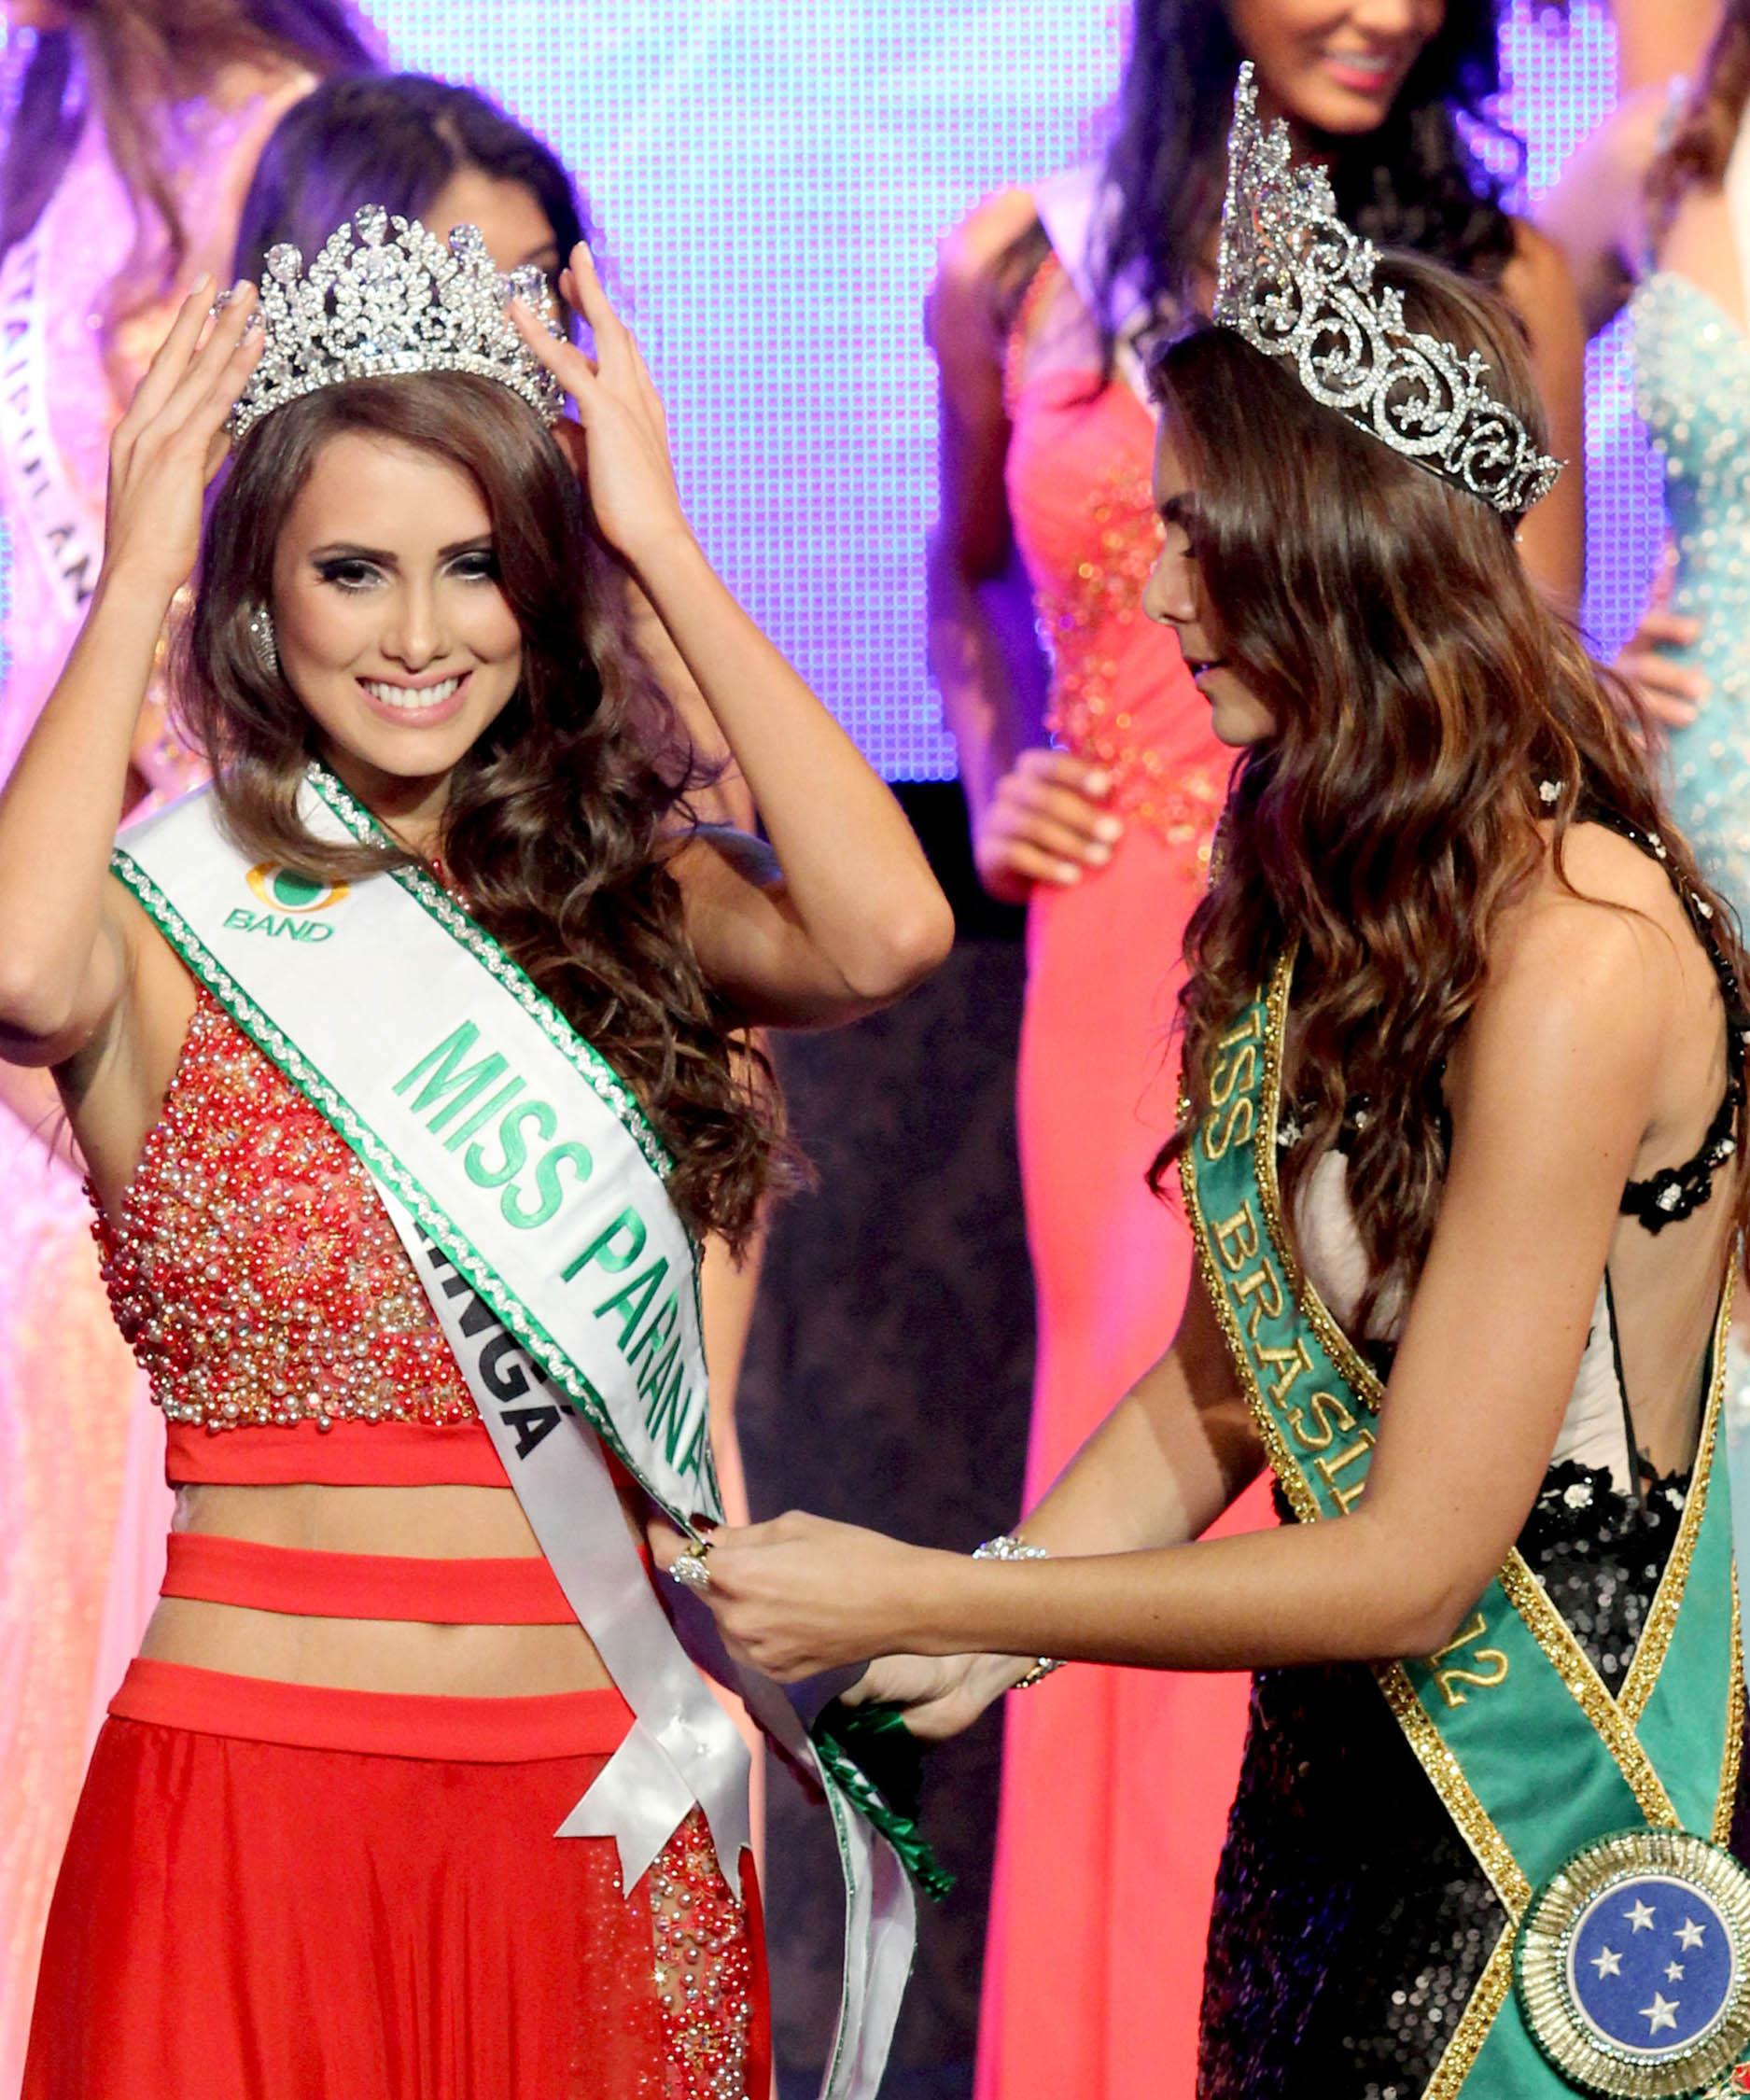 gabriela markus, miss brasil 2012. - Página 4 64ya5vwd